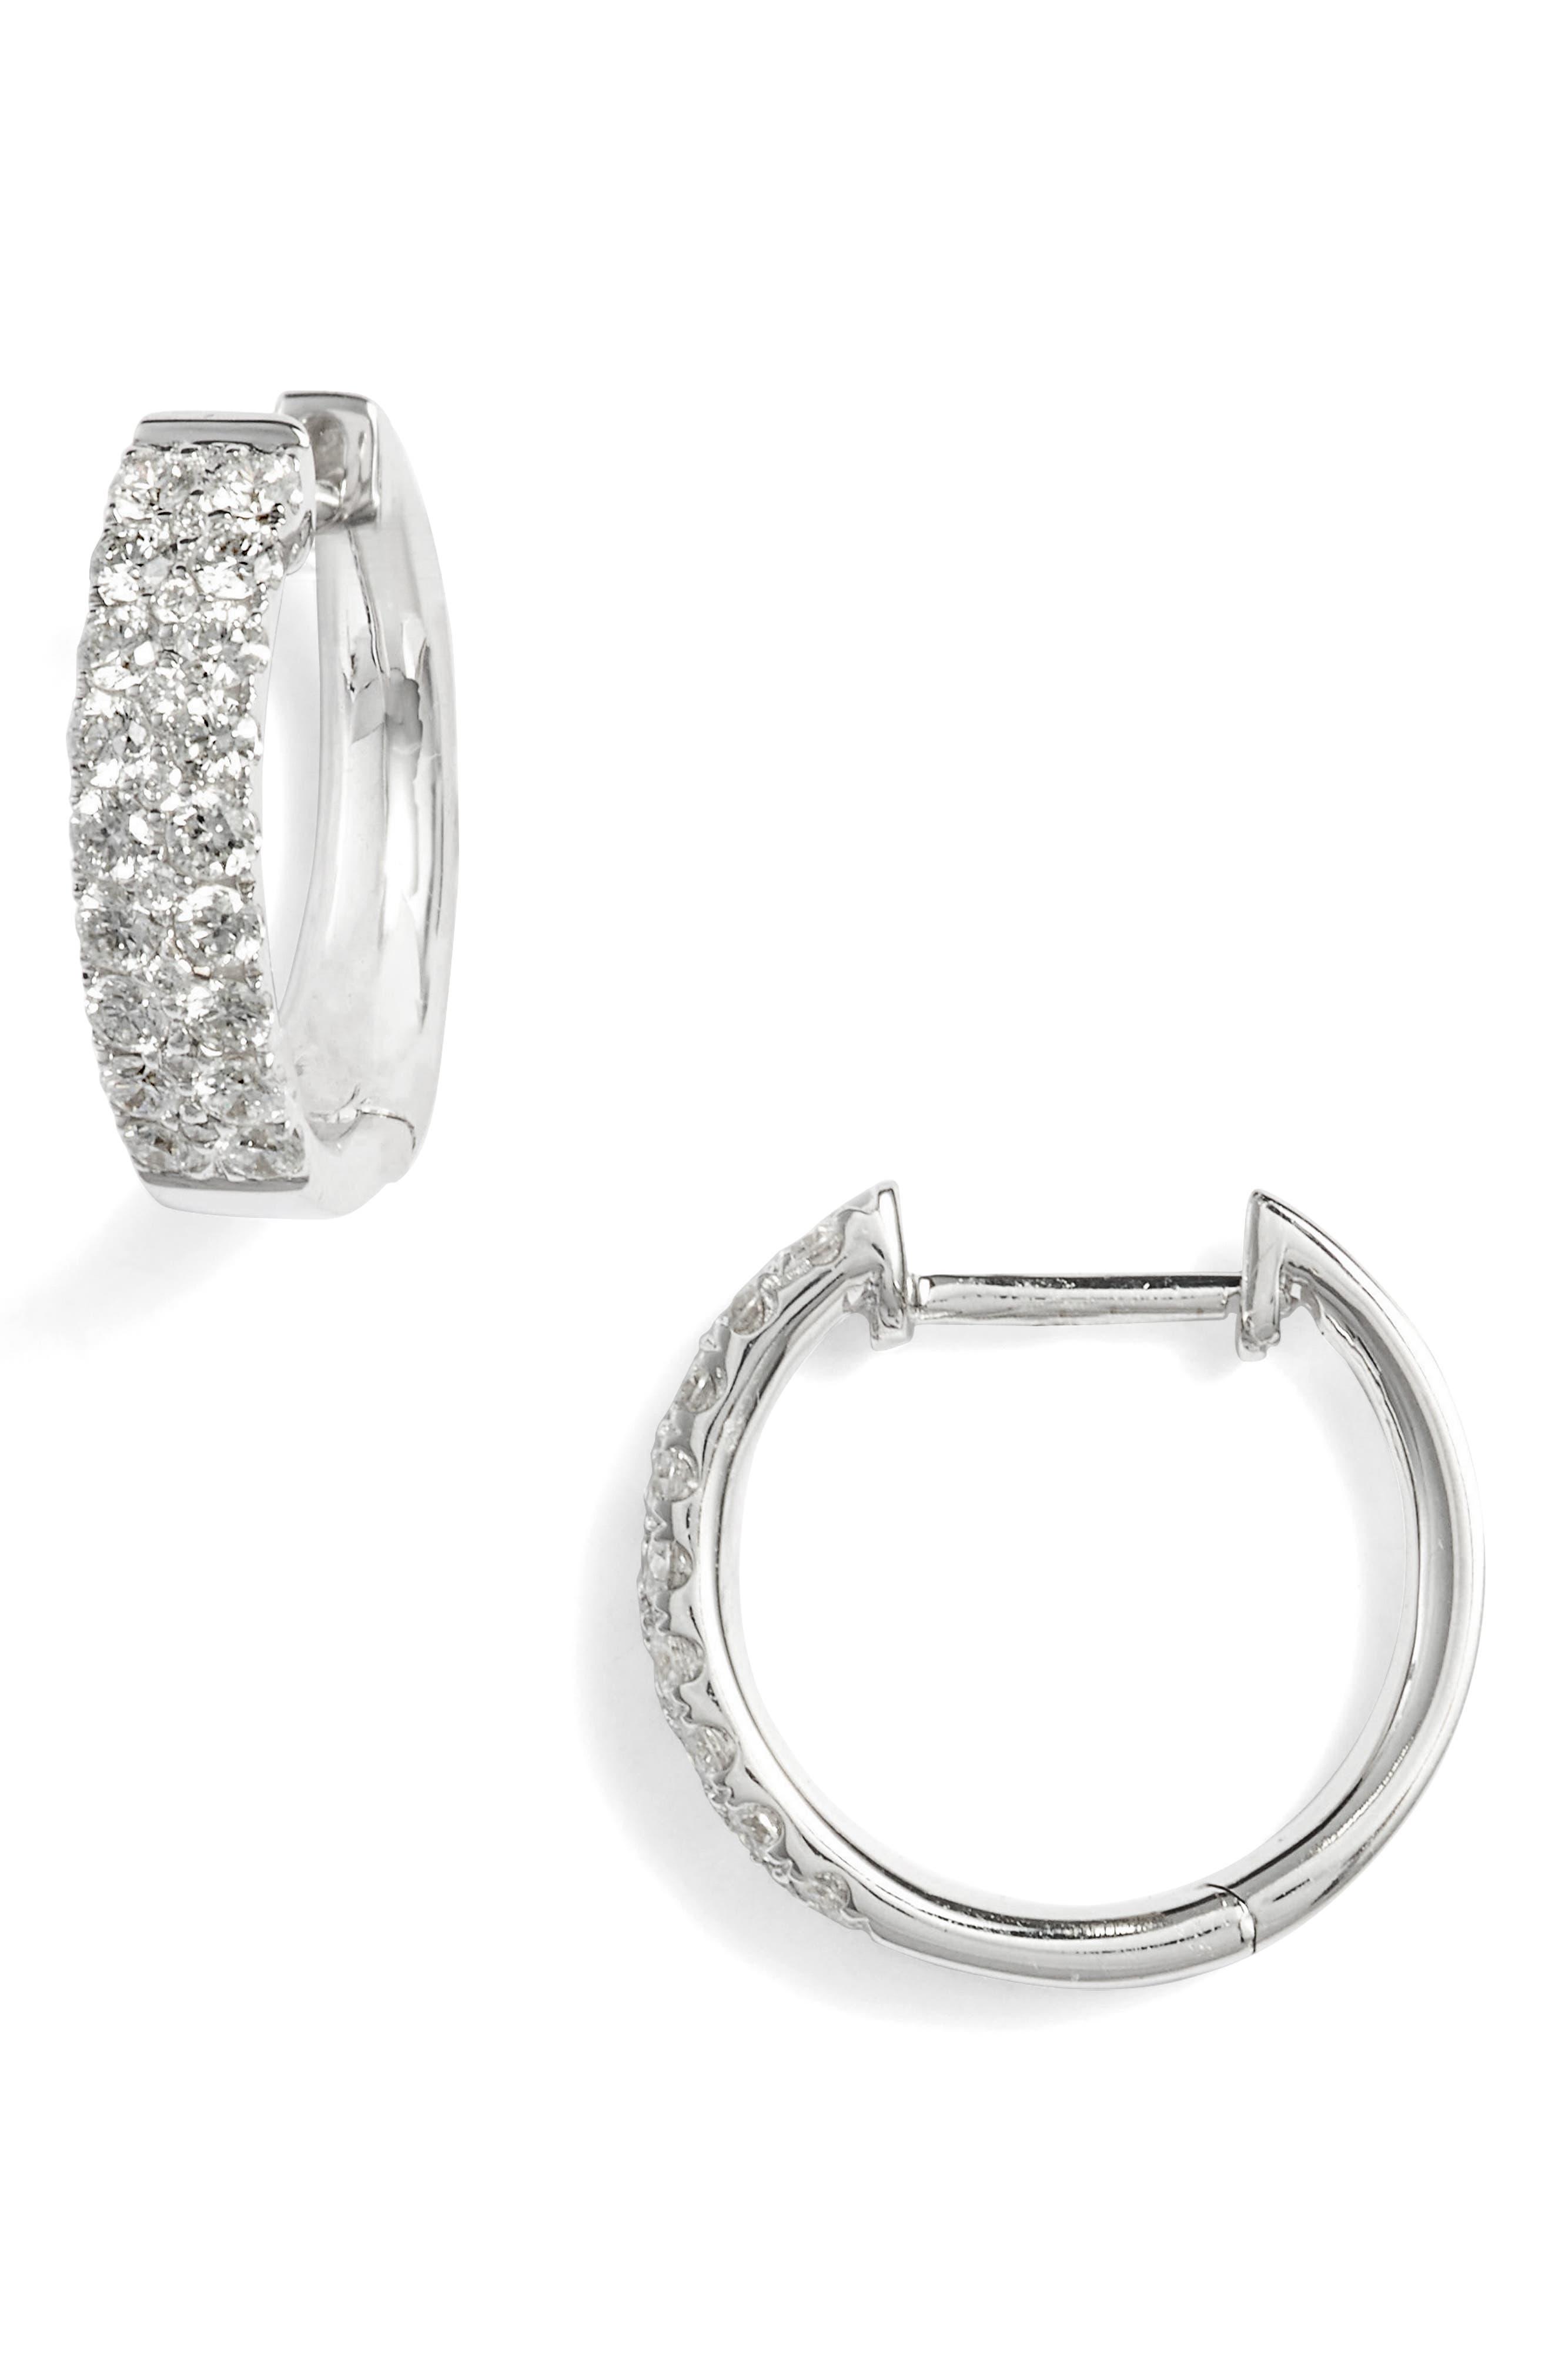 Kiera Small Diamond Hoop Earrings,                         Main,                         color, White Gold